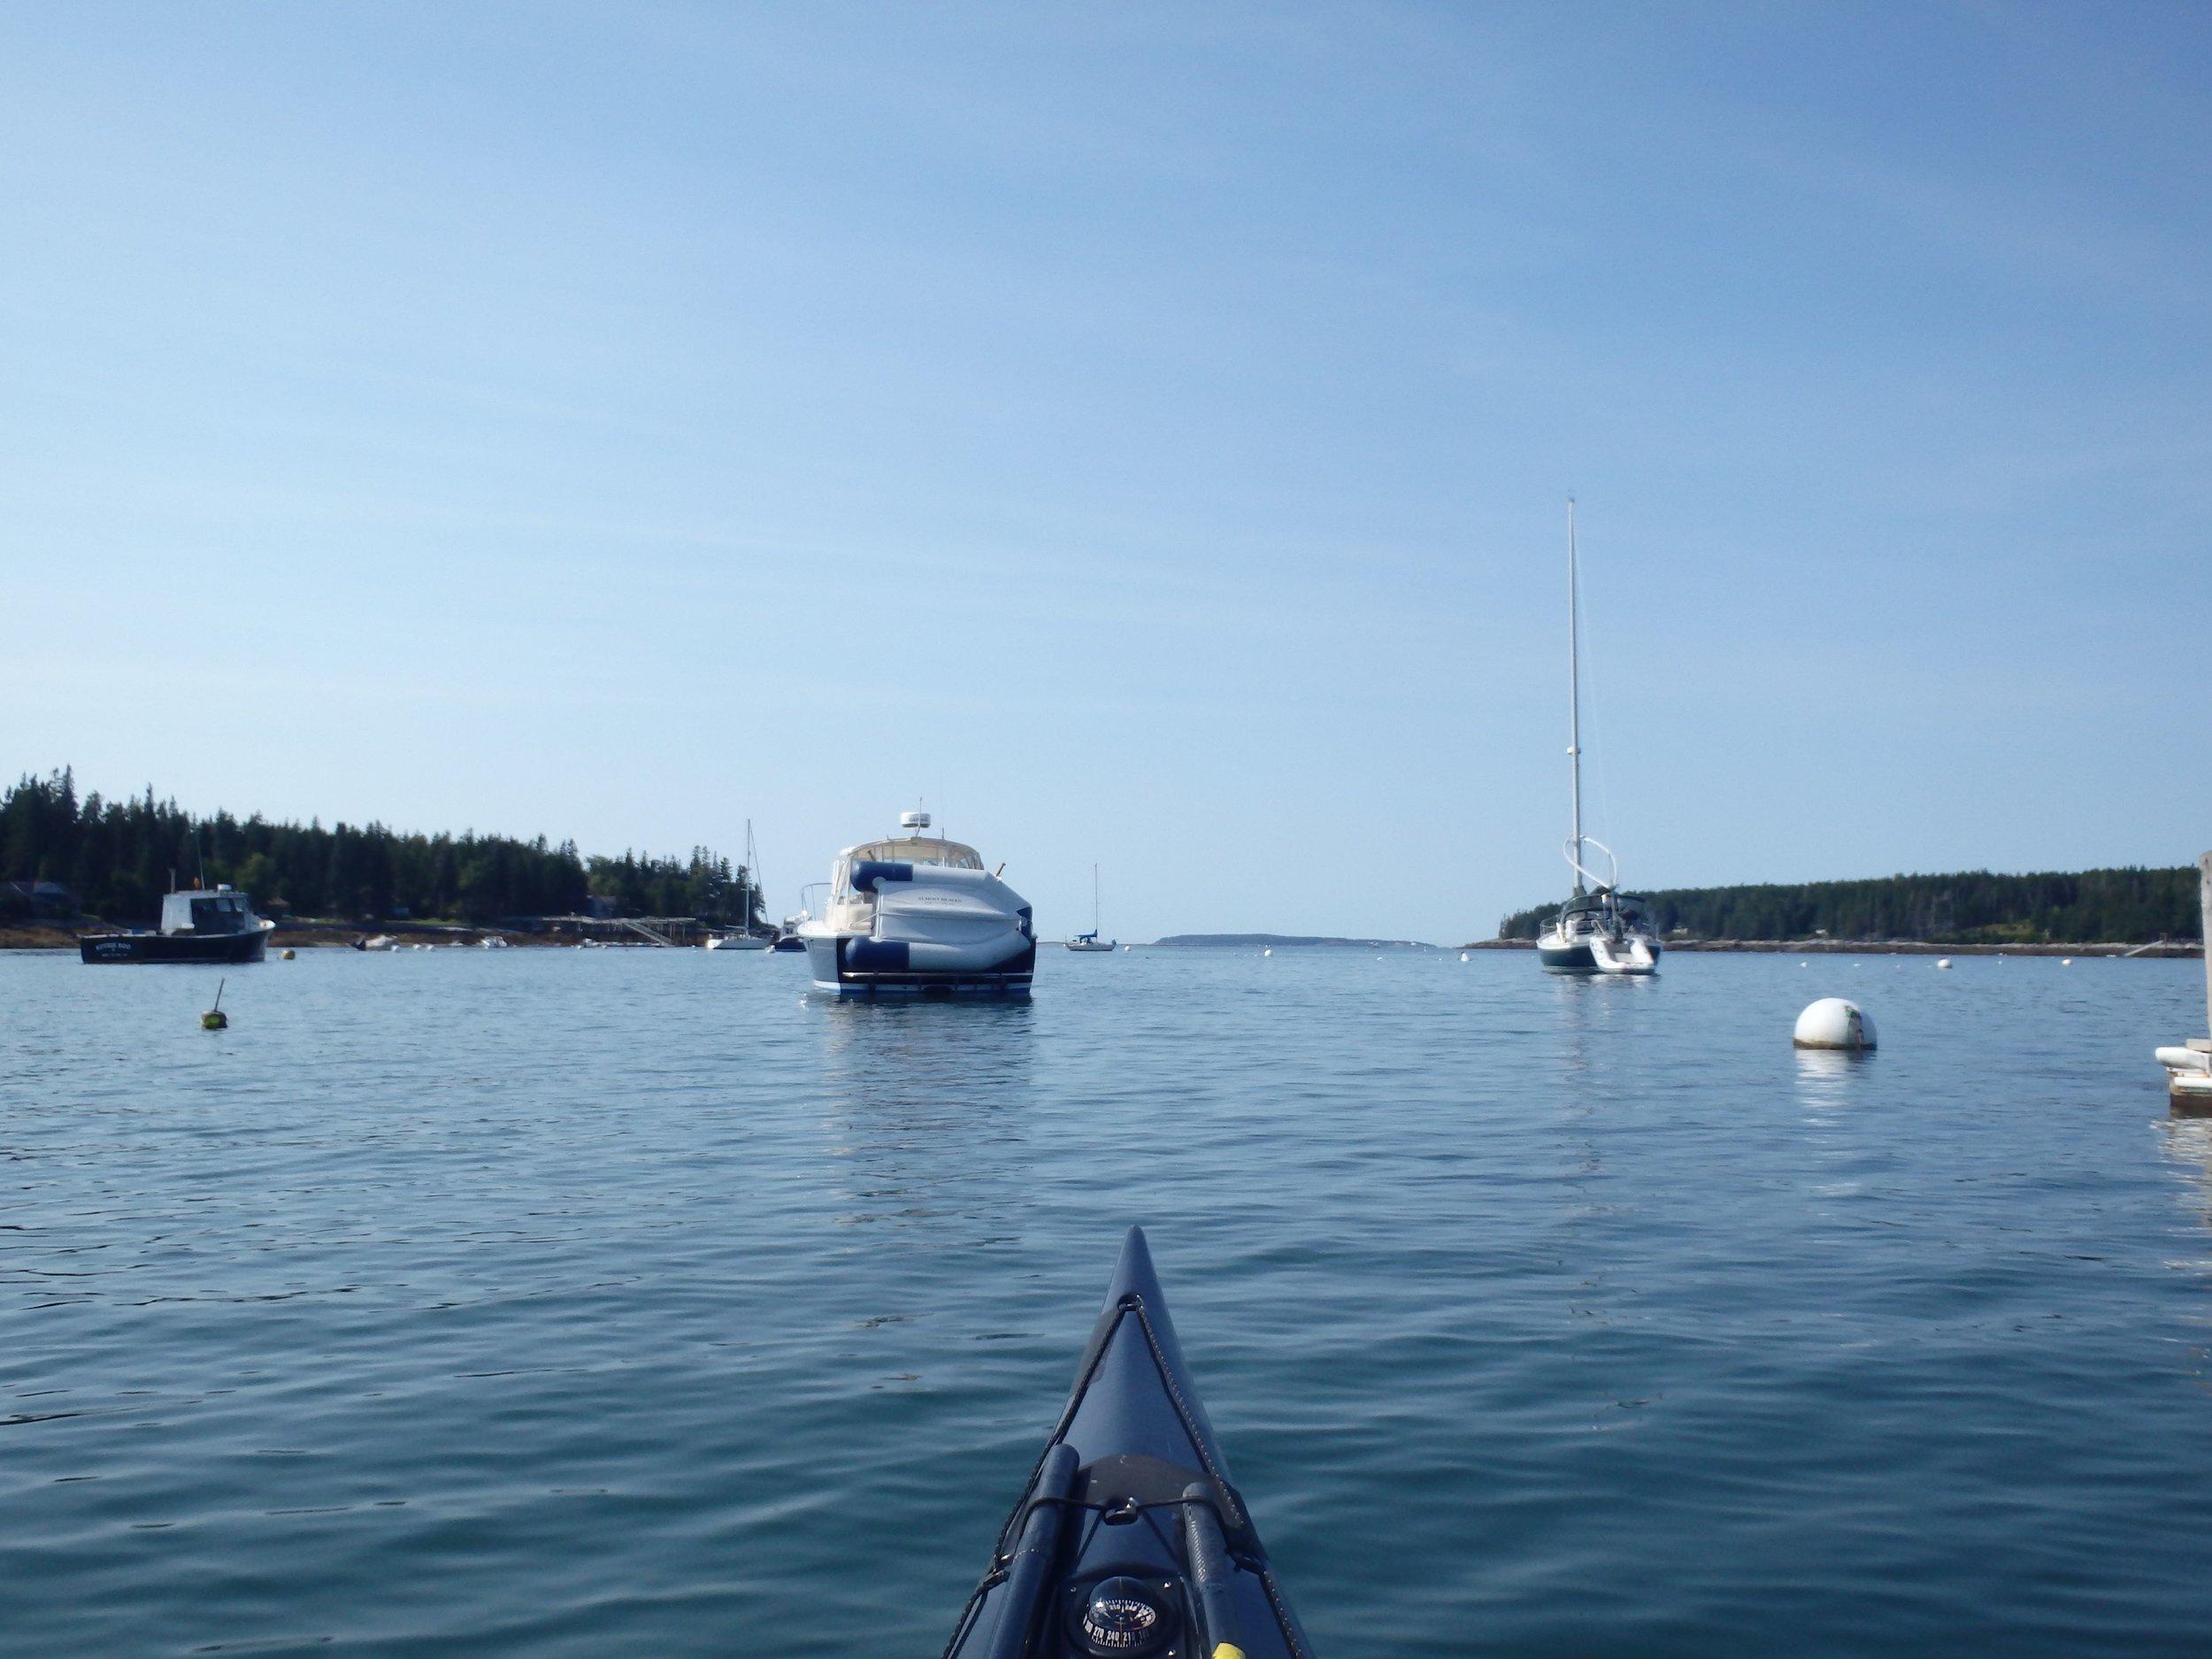 Leaving Port Clyde